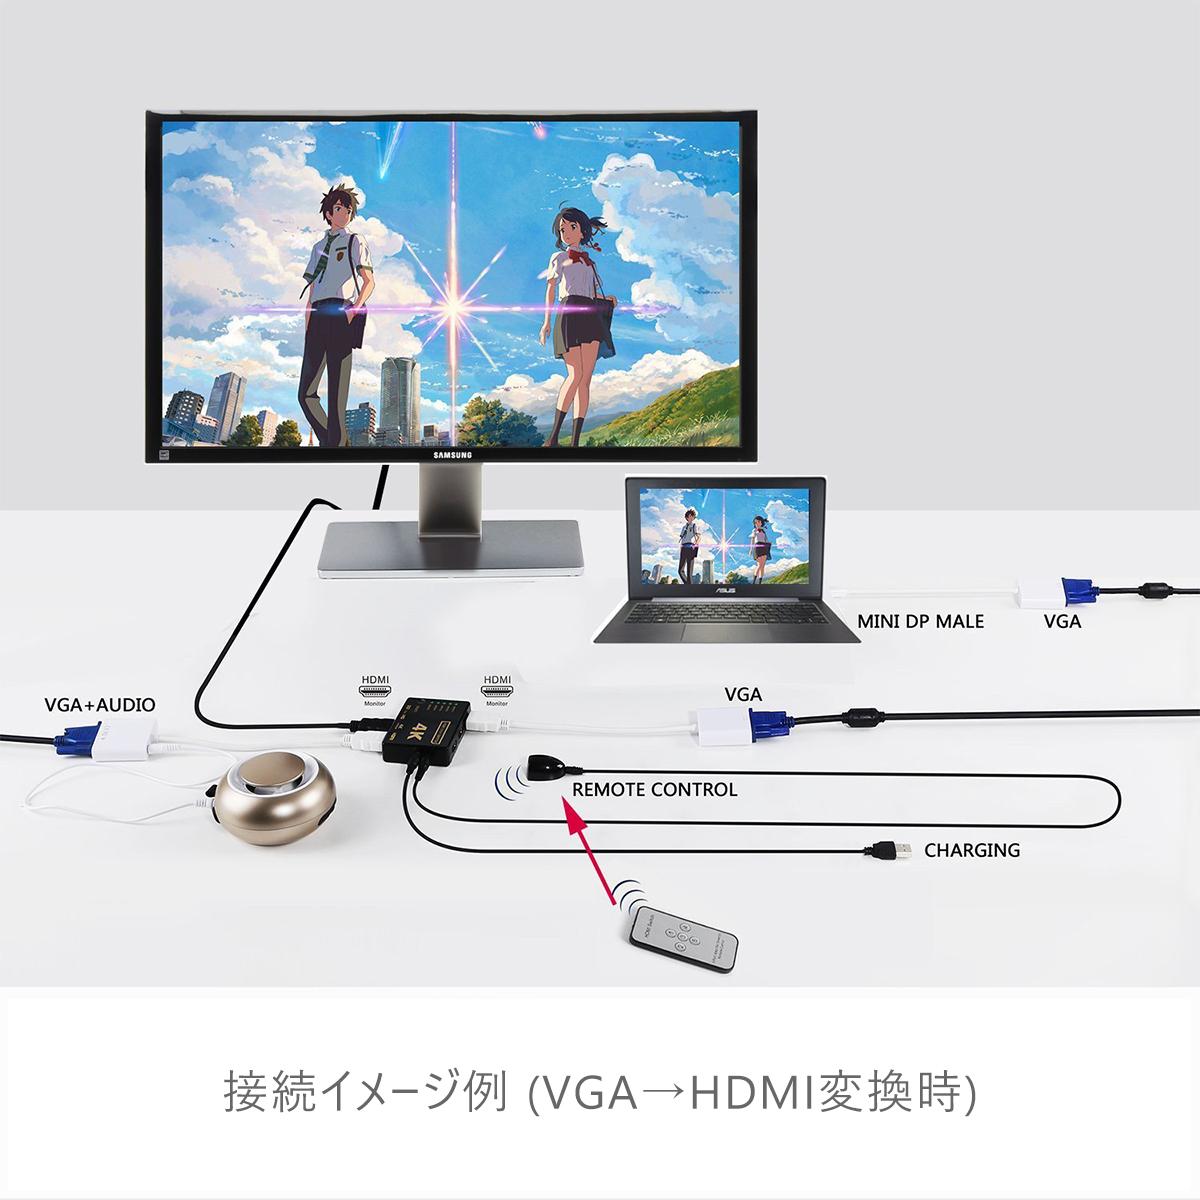 【楽天市場】HDMI 分配器 4K 2K 切替器 Fire Tv Stick HDMI セレクター 5入力1出力